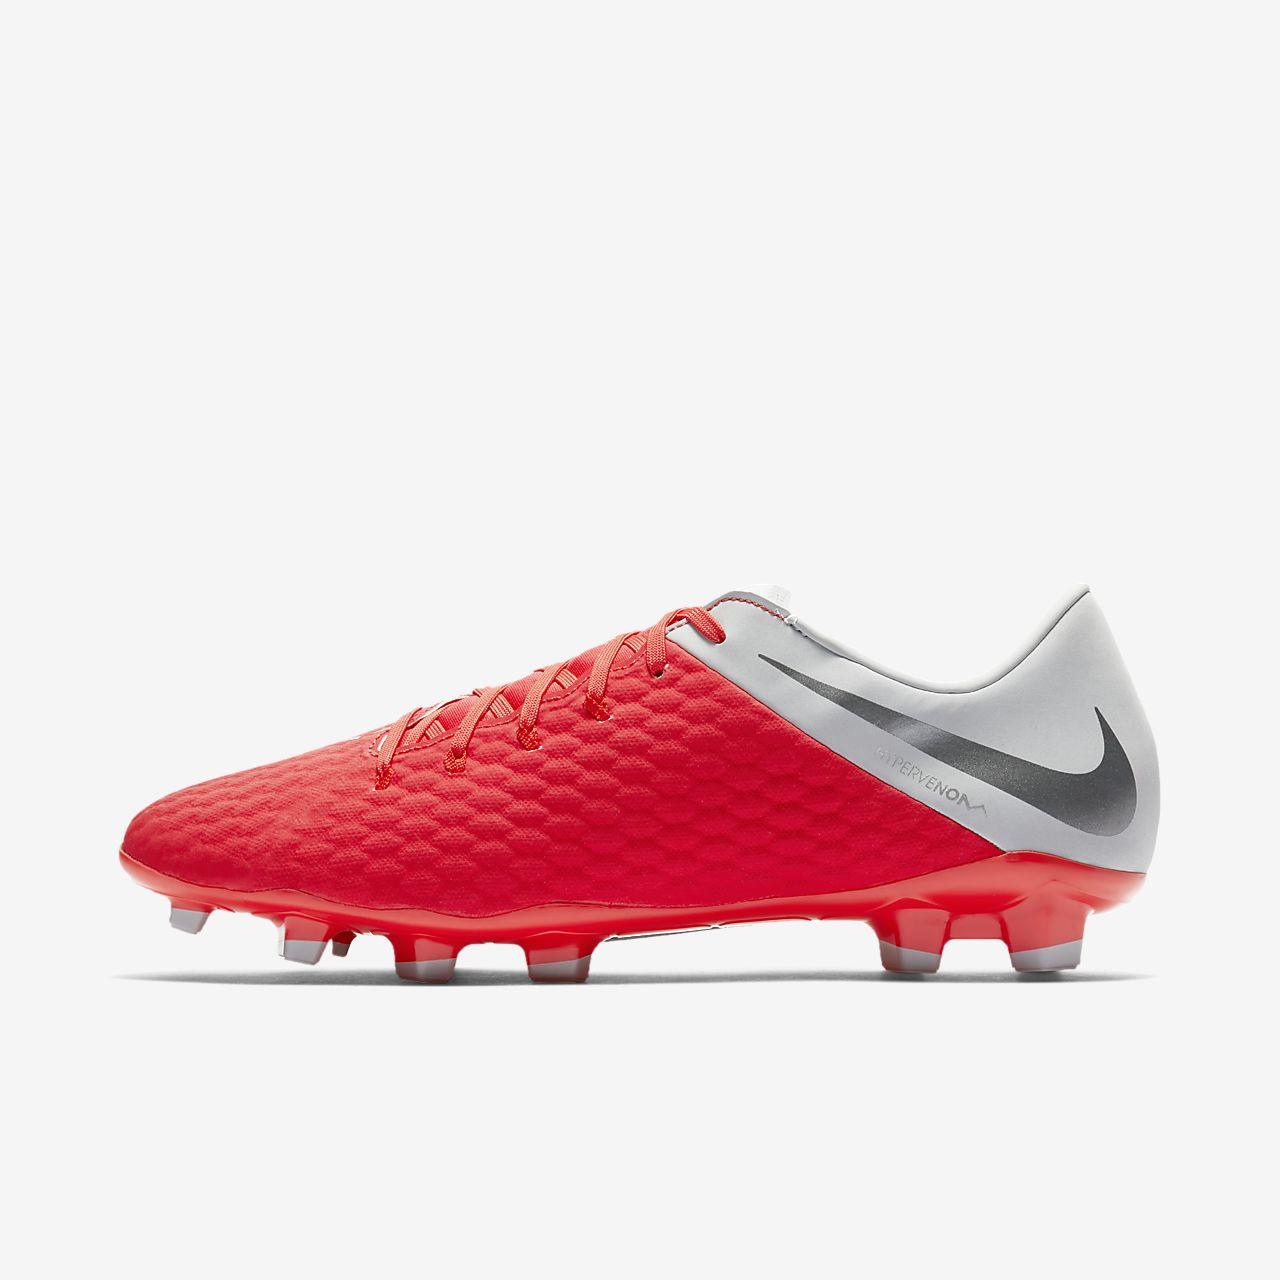 6c69d0e9a hot nike hypervenom phantom iii academy firm ground football boot 5b315  611f7